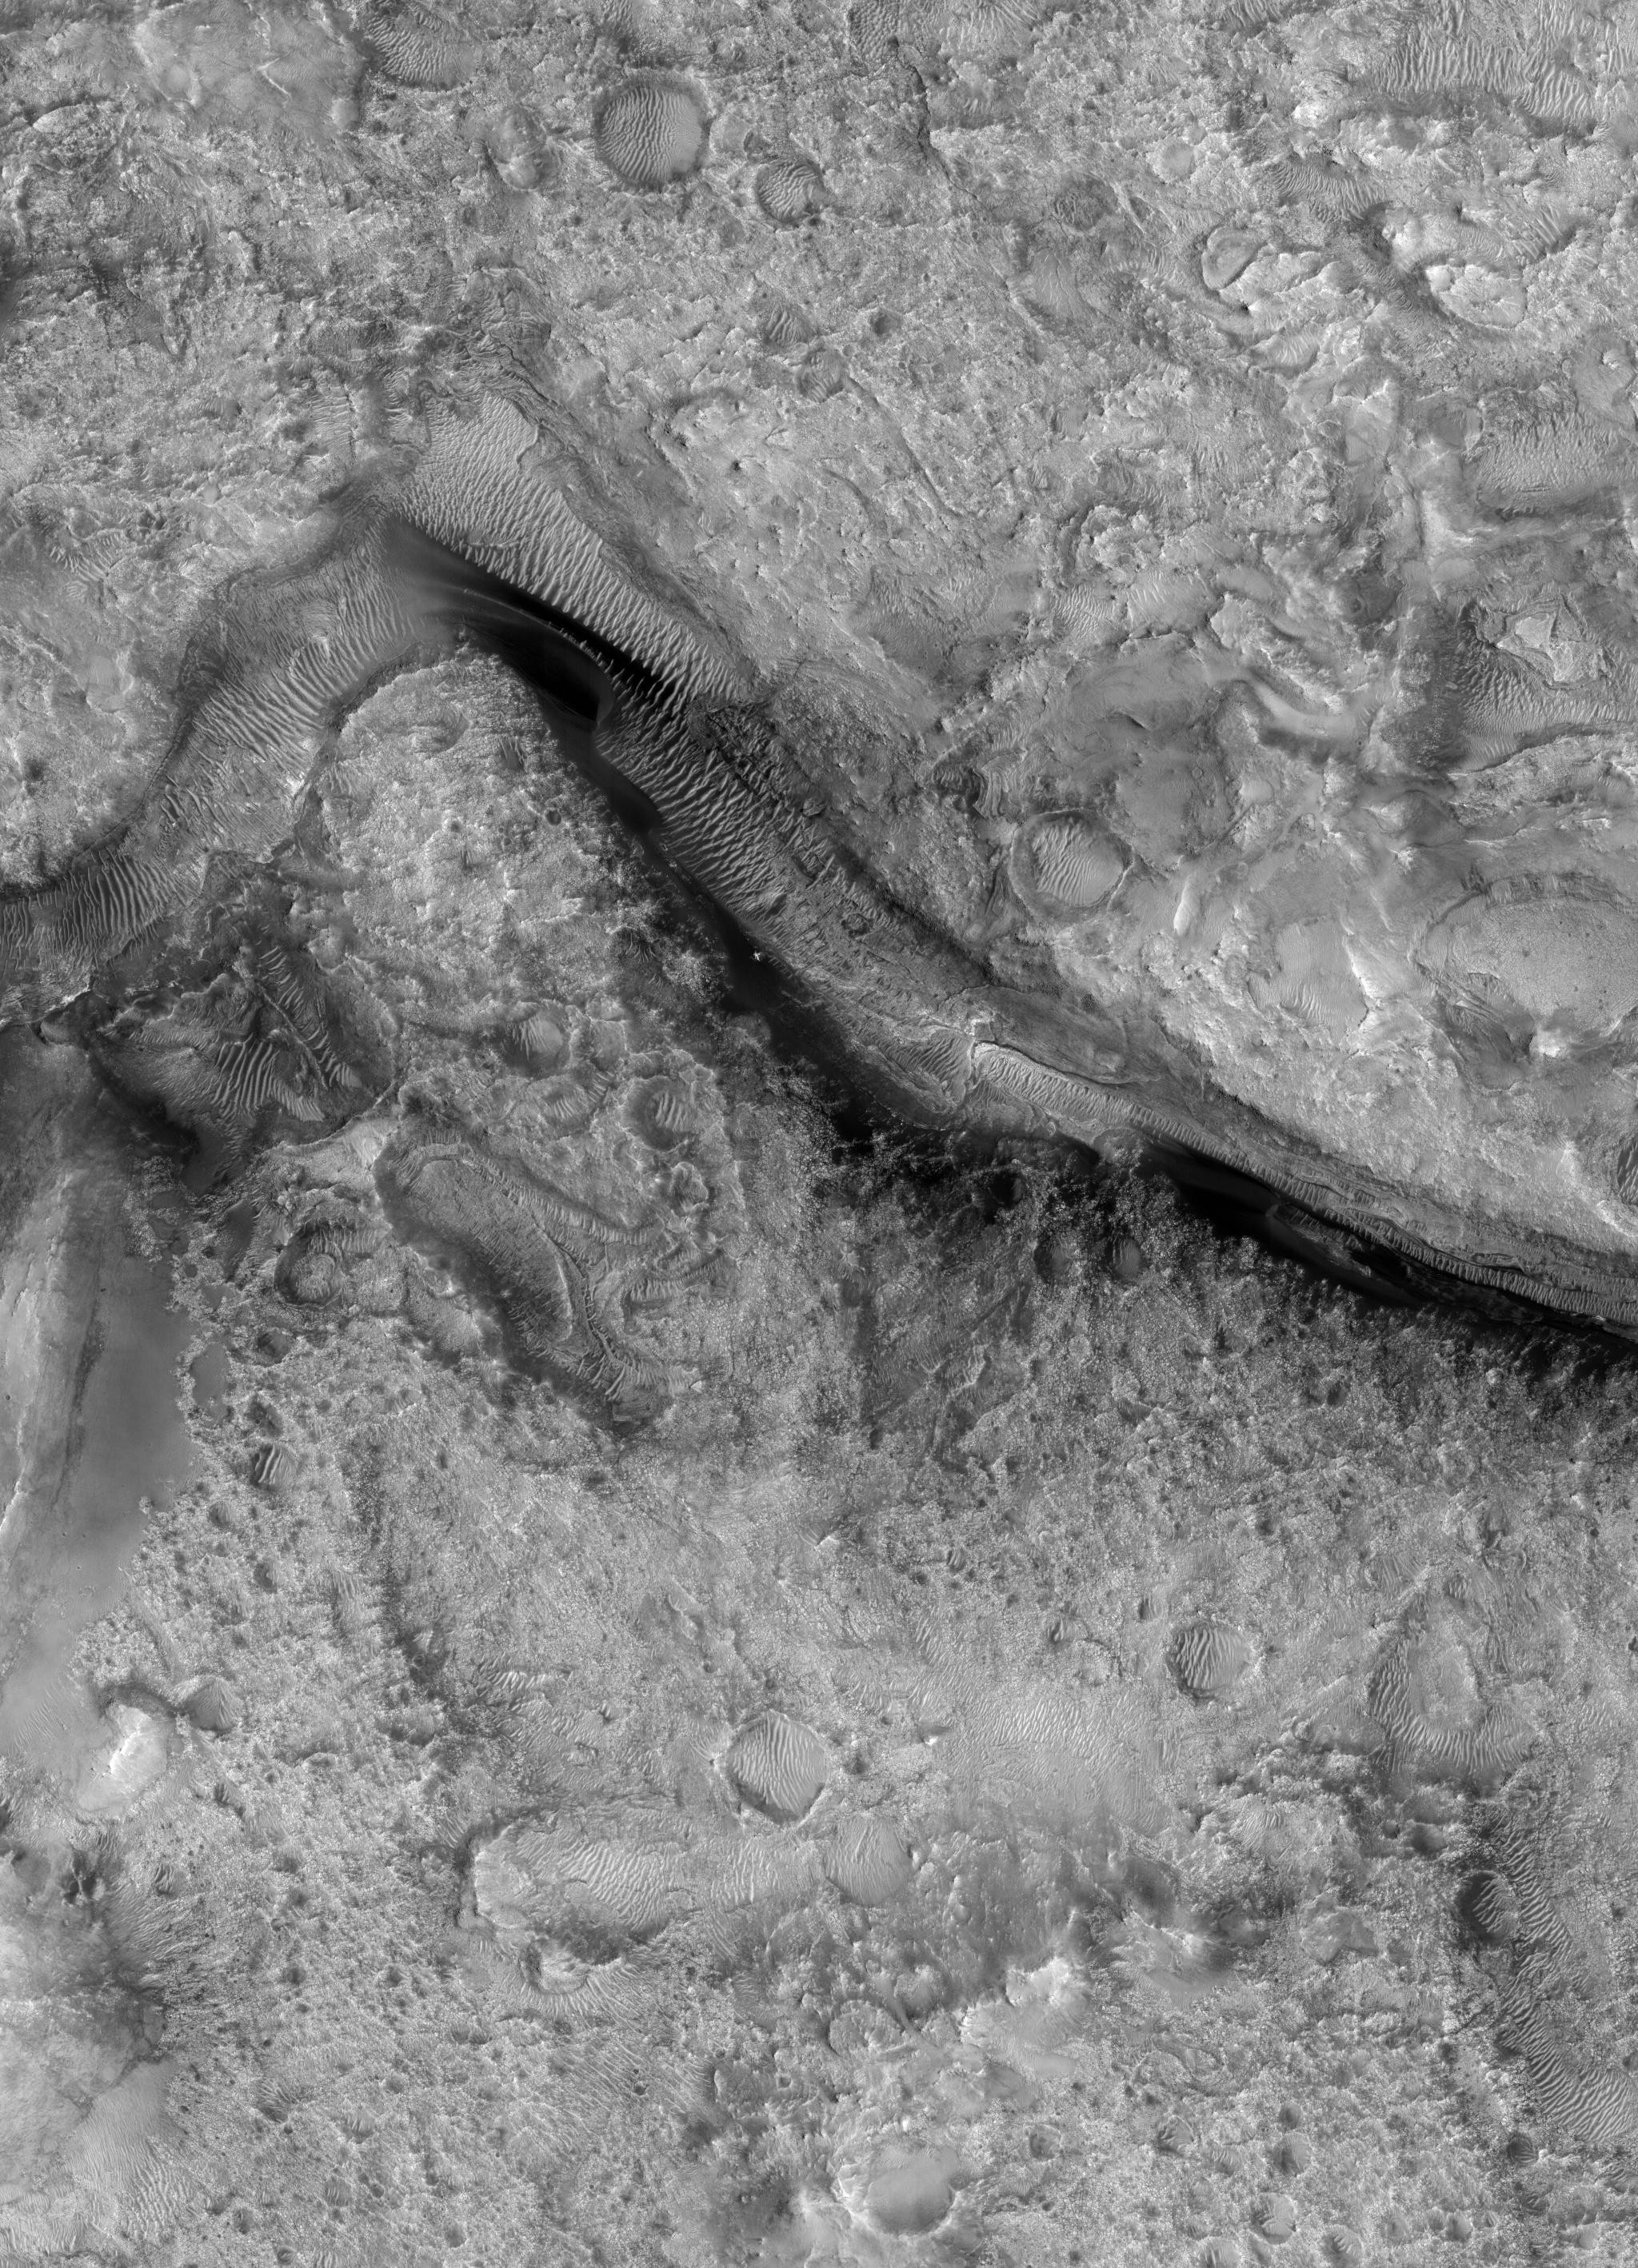 Jezero Crater area for possible future landing site! Image: ASU-HiRISE.